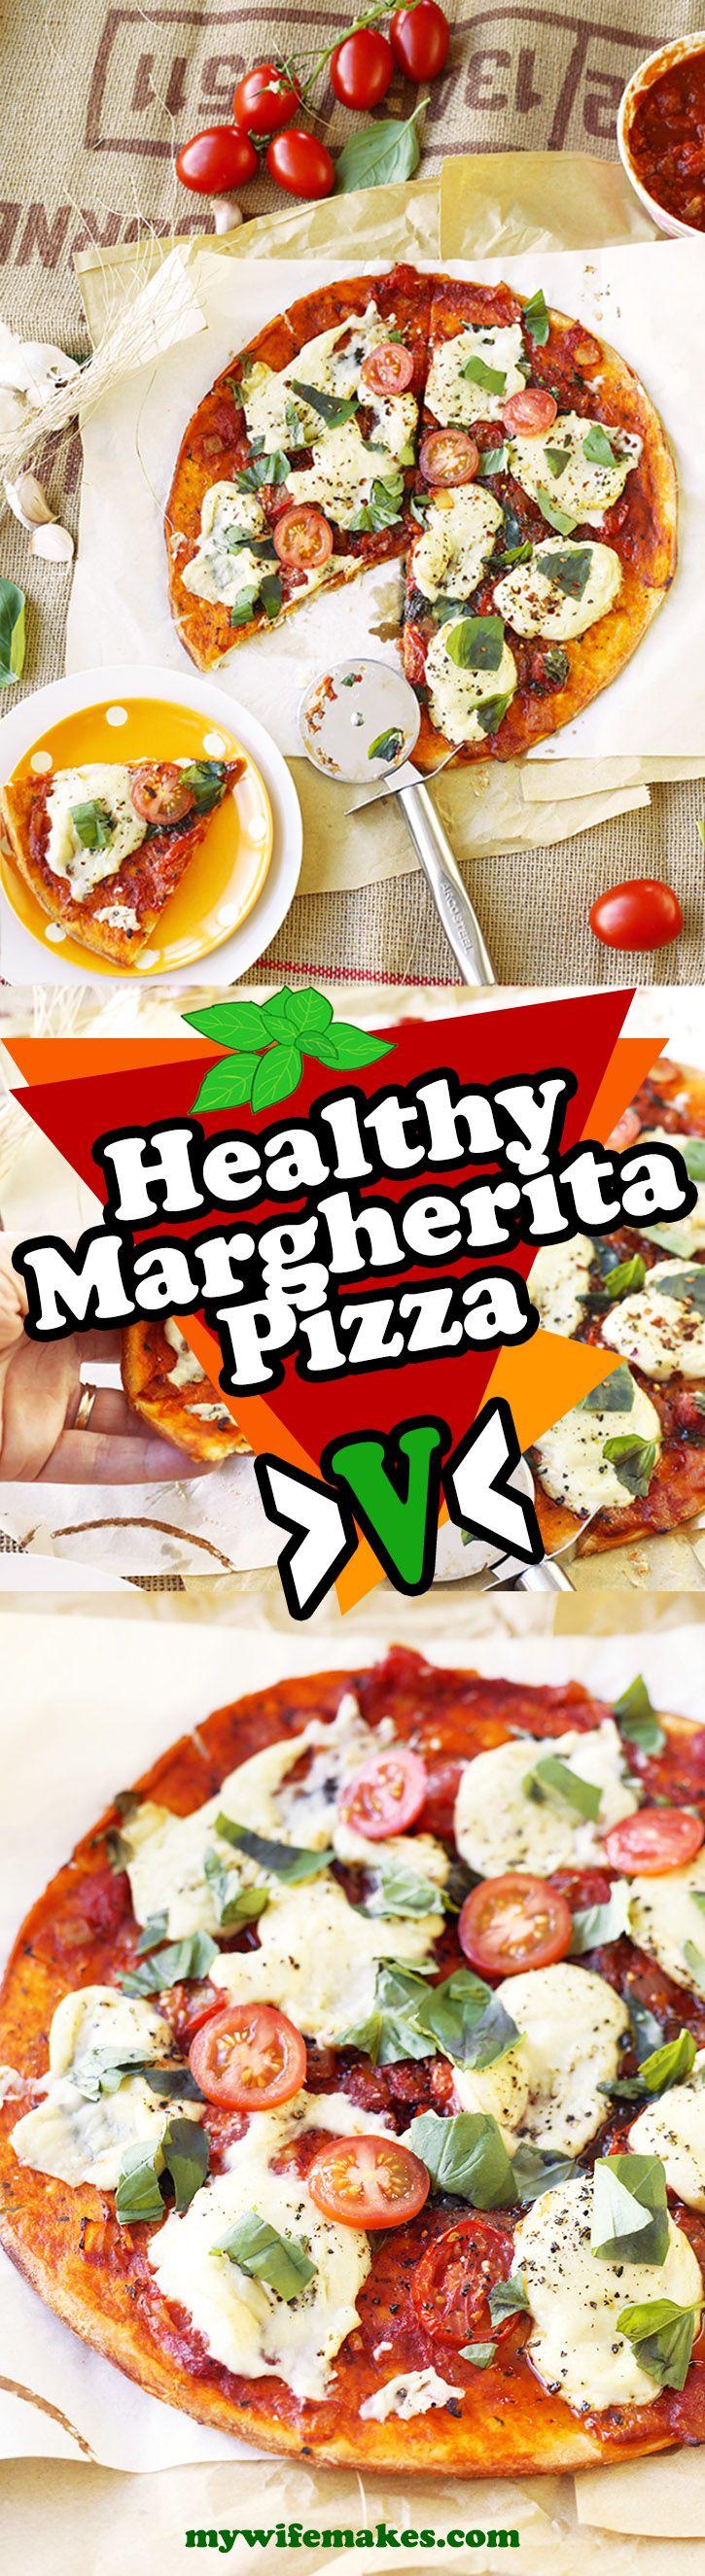 Vegan Pizza Margherita - simple, delicious, hearty, satisfying.... Great vegetarian board http://www.pinterest.com/limened/vegetarian-recipe/